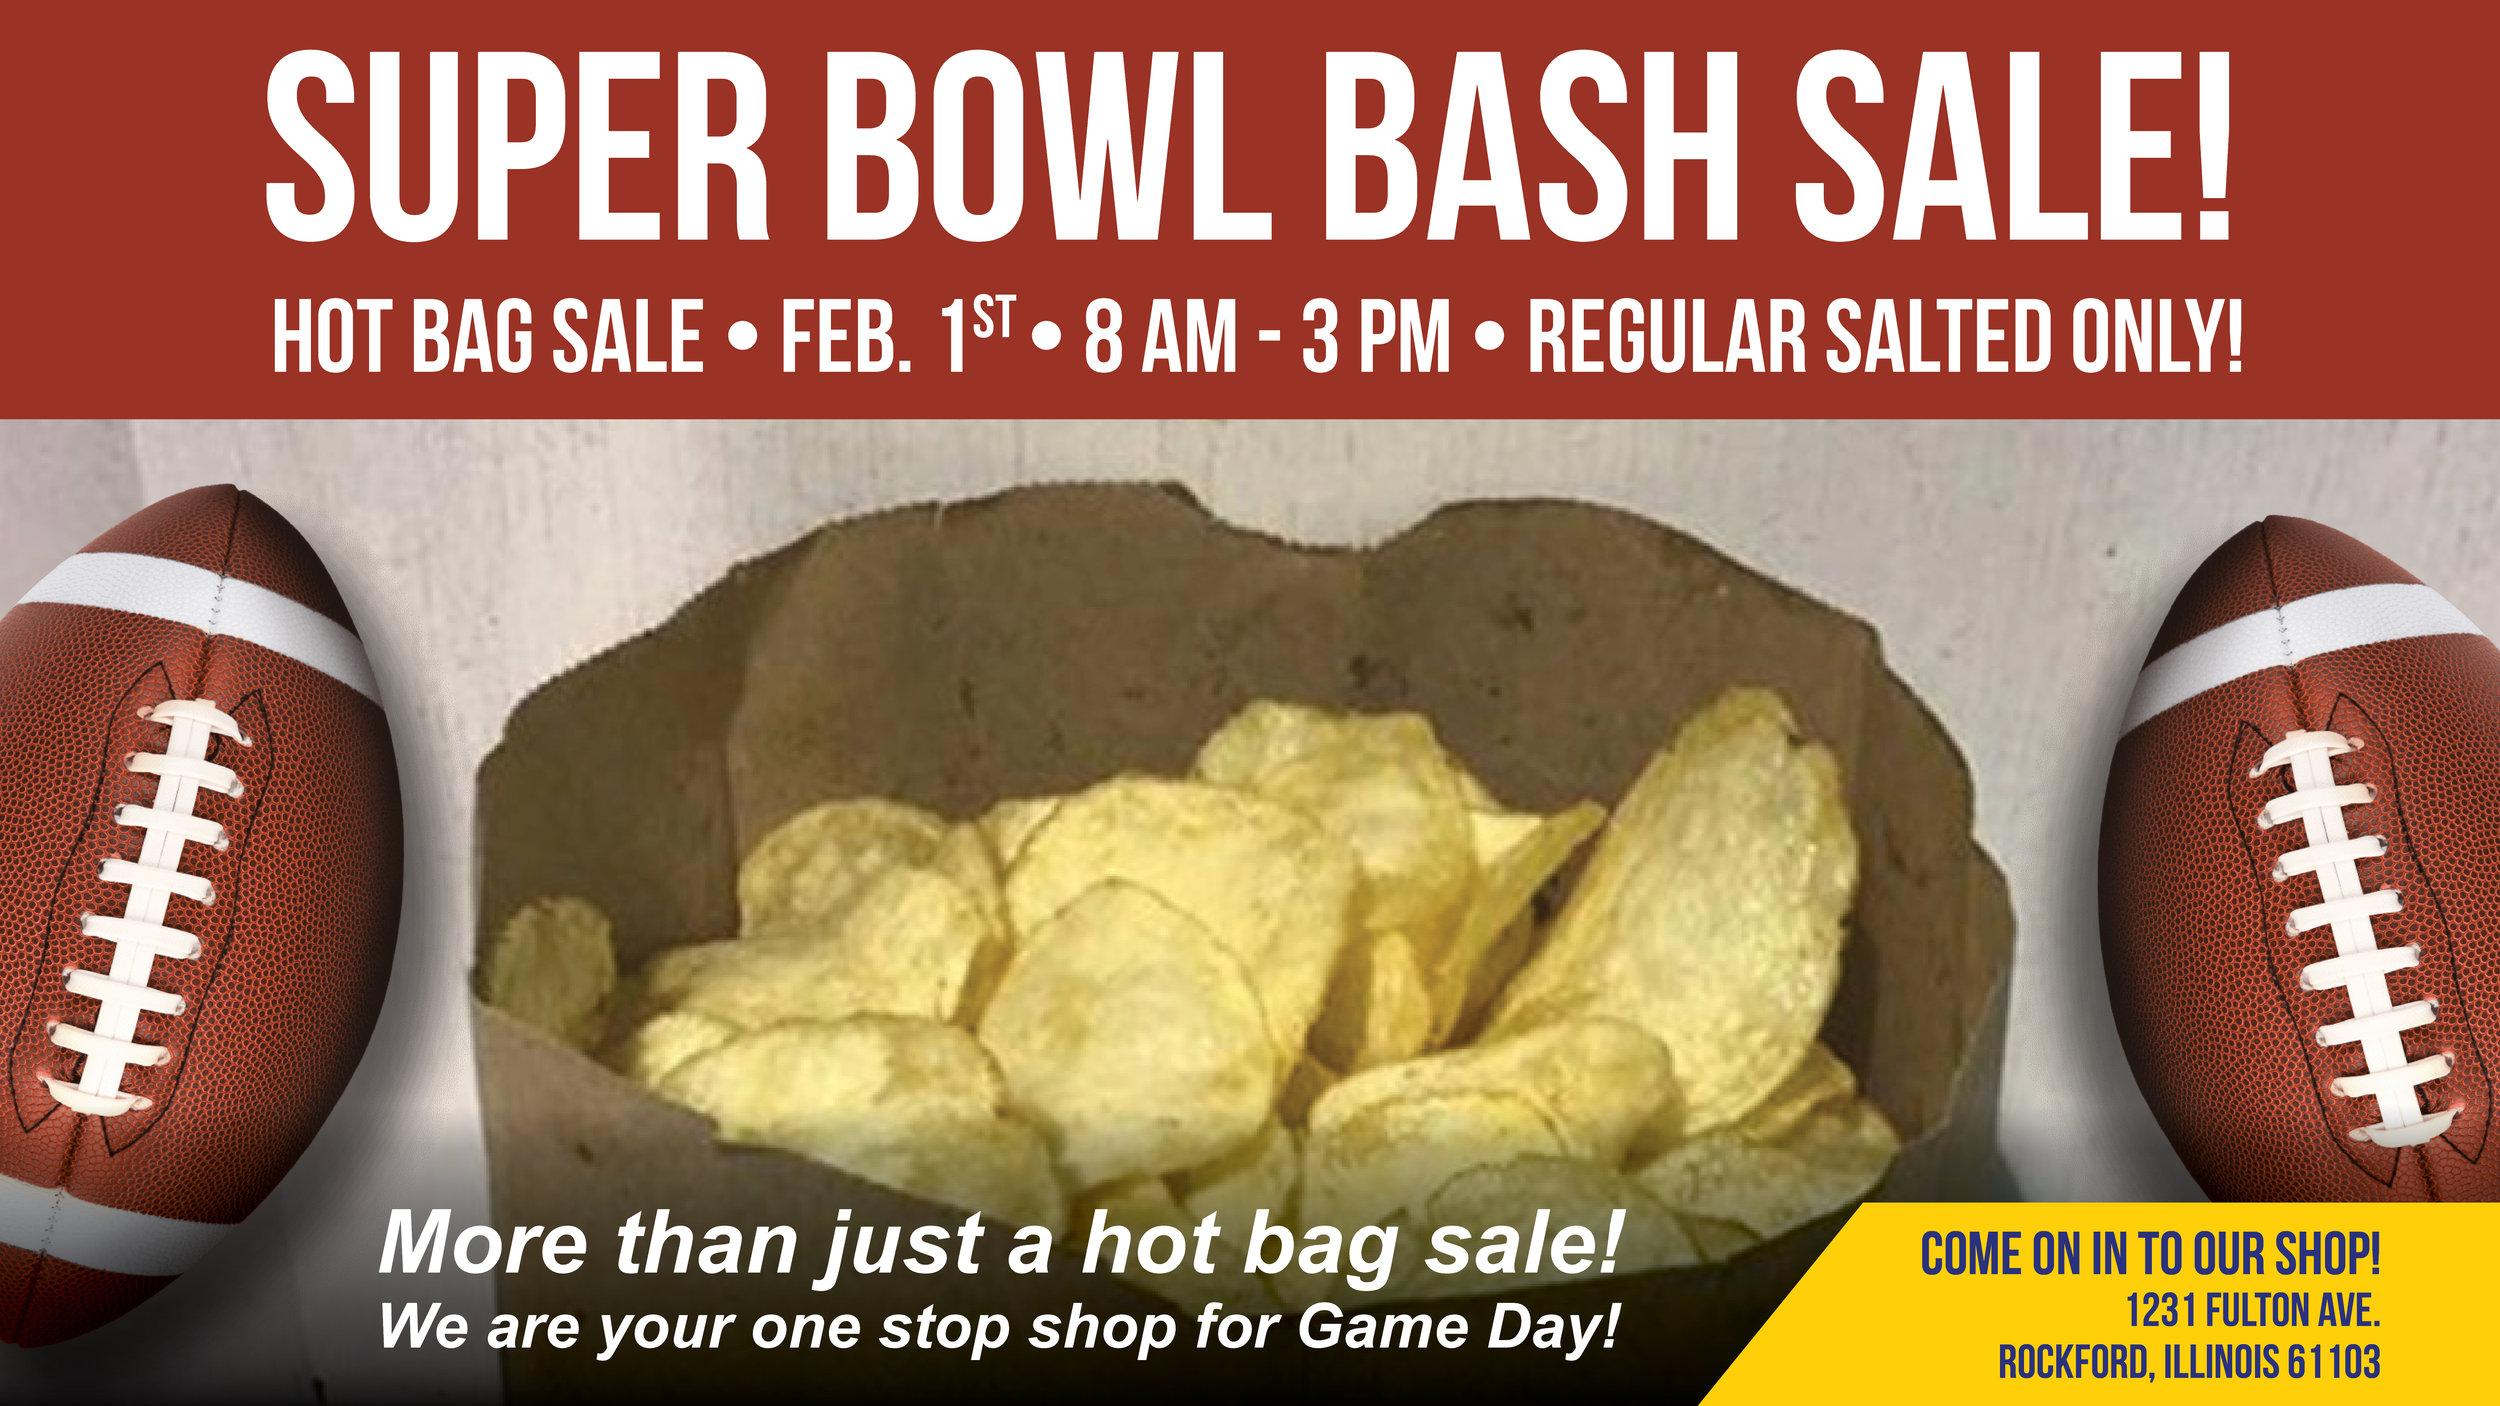 Superbowl Feb 1st-hotbag.jpg